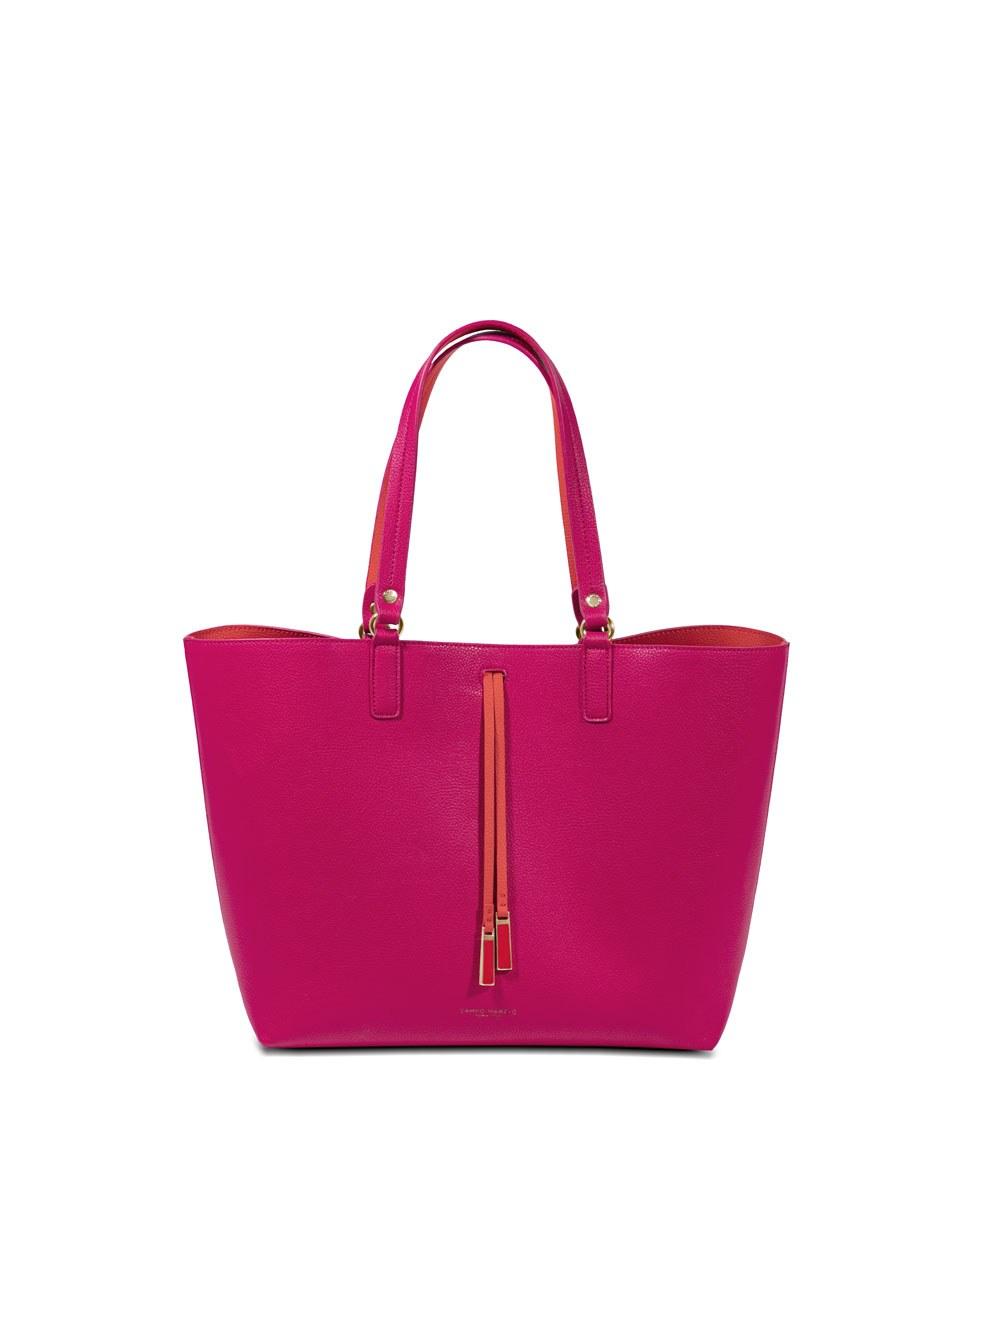 Shopper Bag With Inner Bag Maxi - Magenta